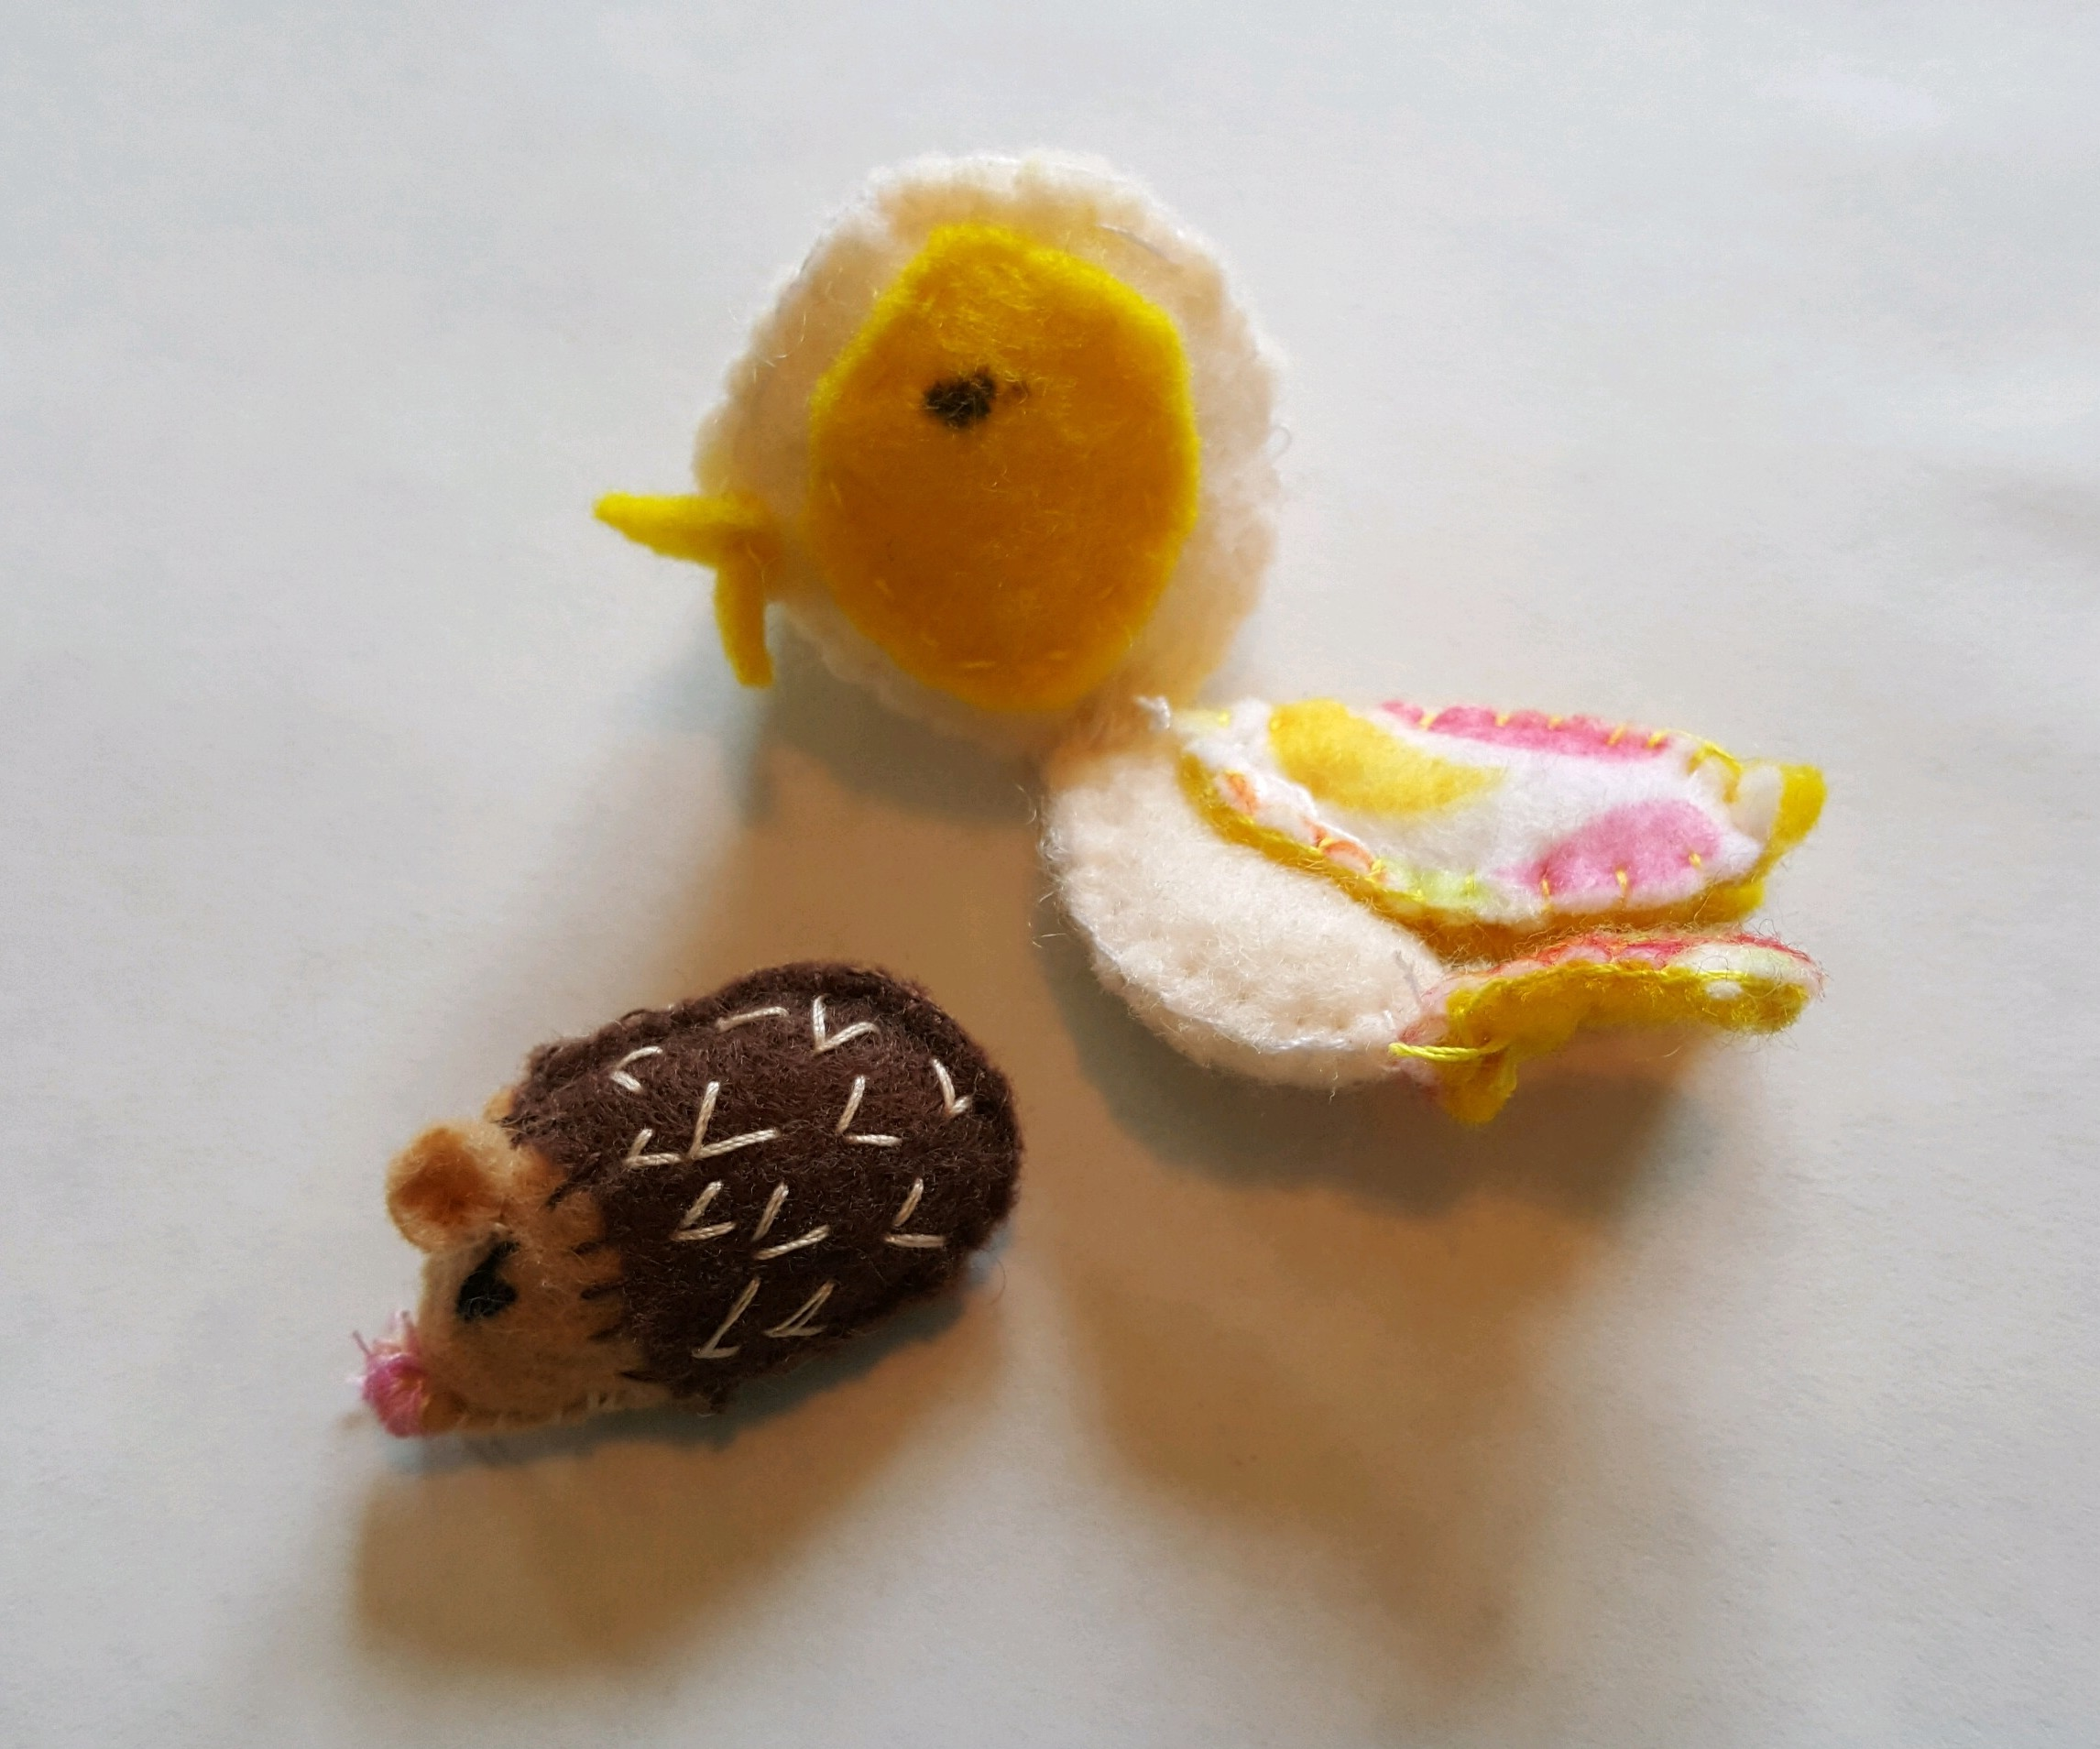 More unbelievable cuteness, handmade by Calista :)